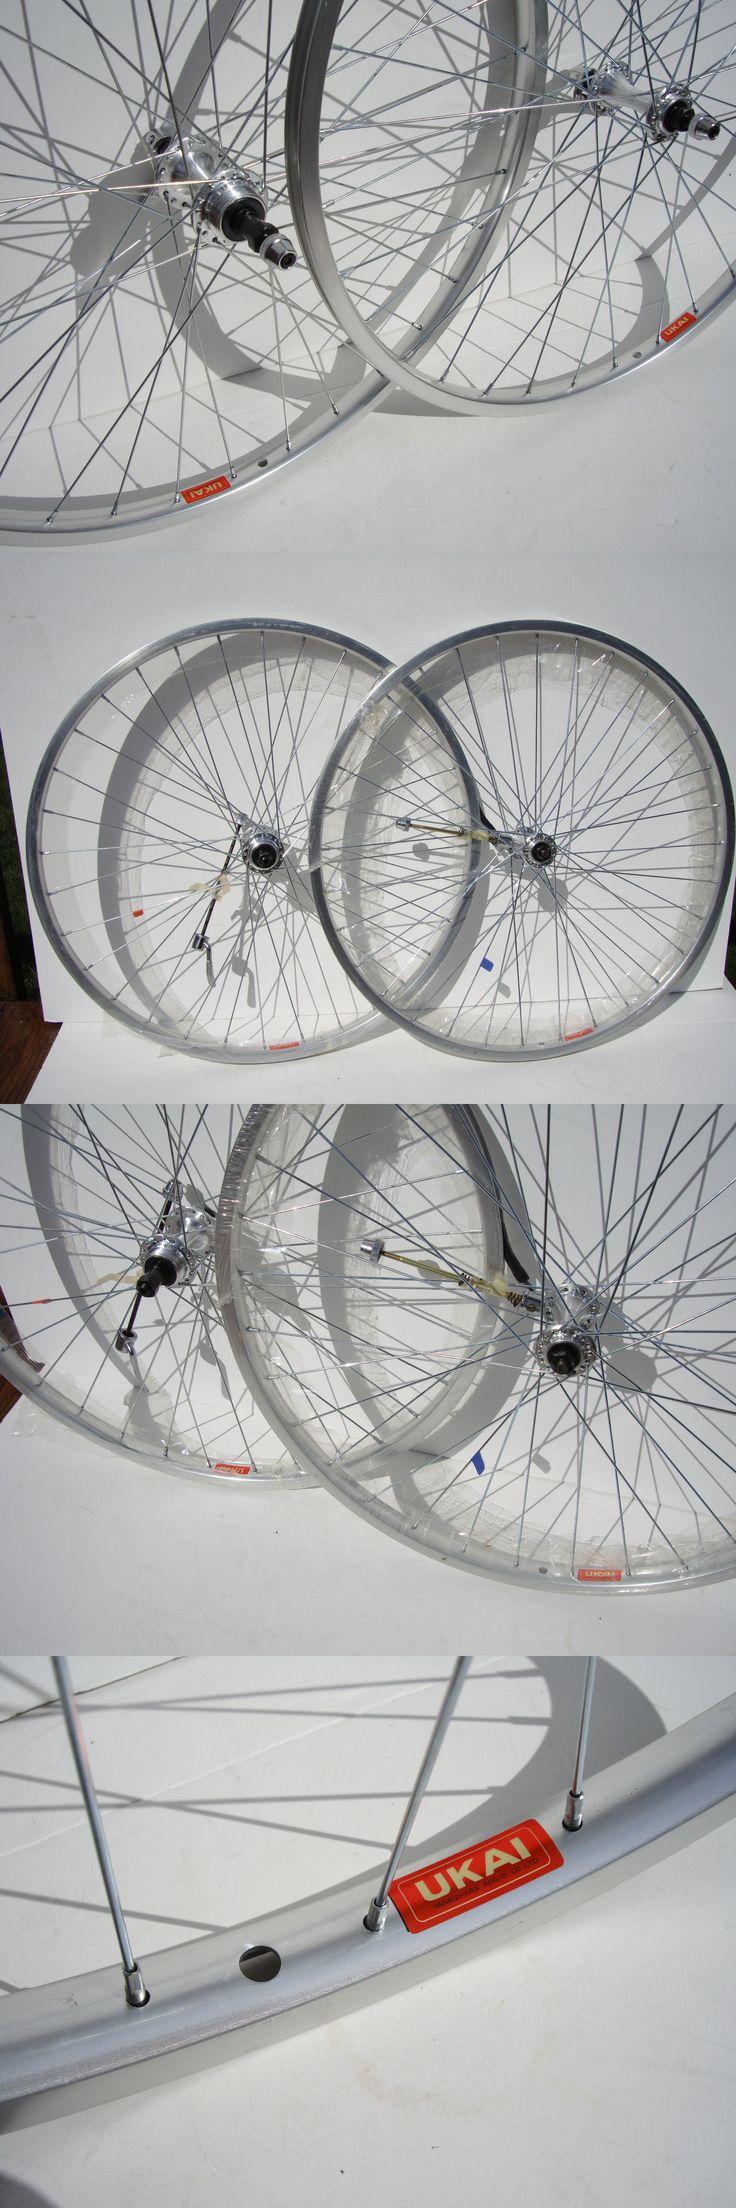 Vintage Bicycle Parts 56197: Nos Ukai 26 Wheels Schwinn Trek Mtb Bike Cruiser Bicycle Mountain 7 8 Speed Vtg -> BUY IT NOW ONLY: $175 on eBay!